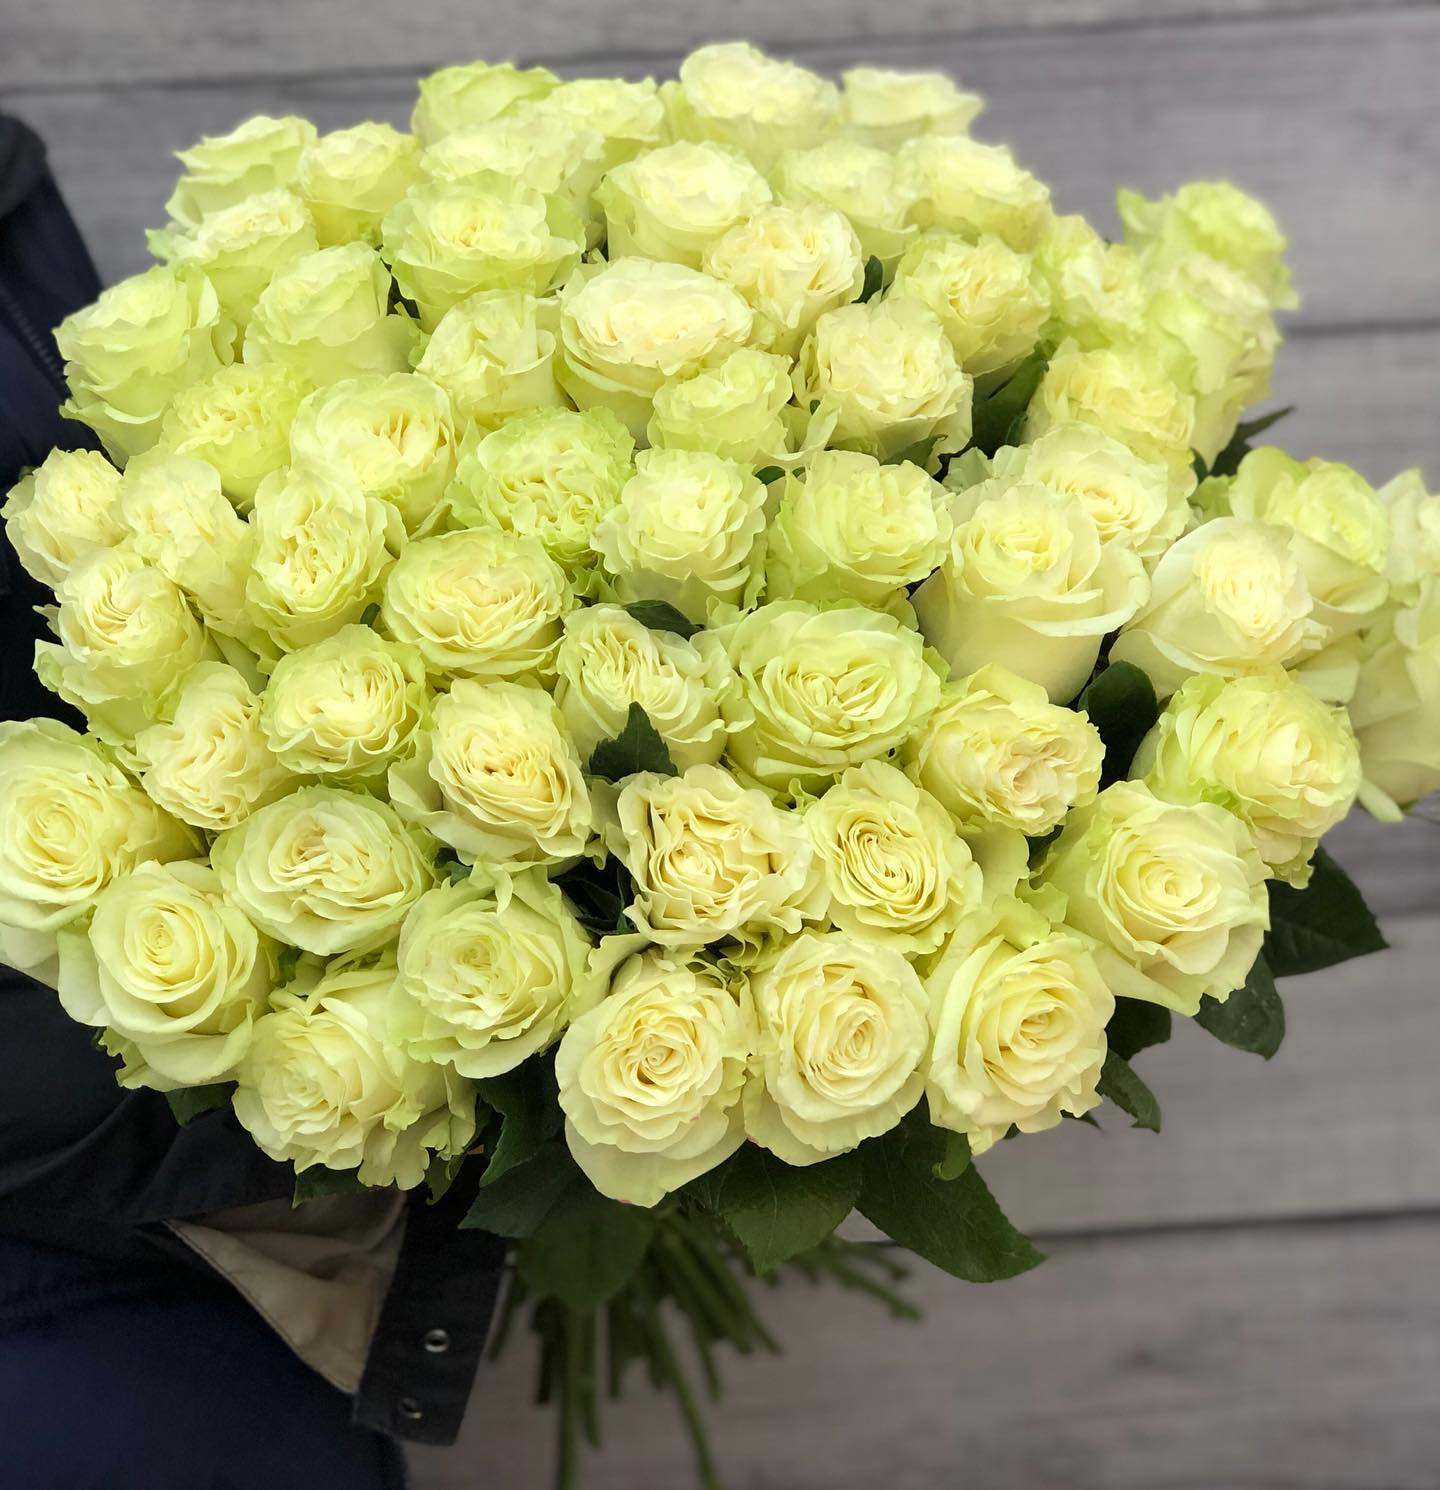 Эквадорская роза белая 60 см - 101 штука